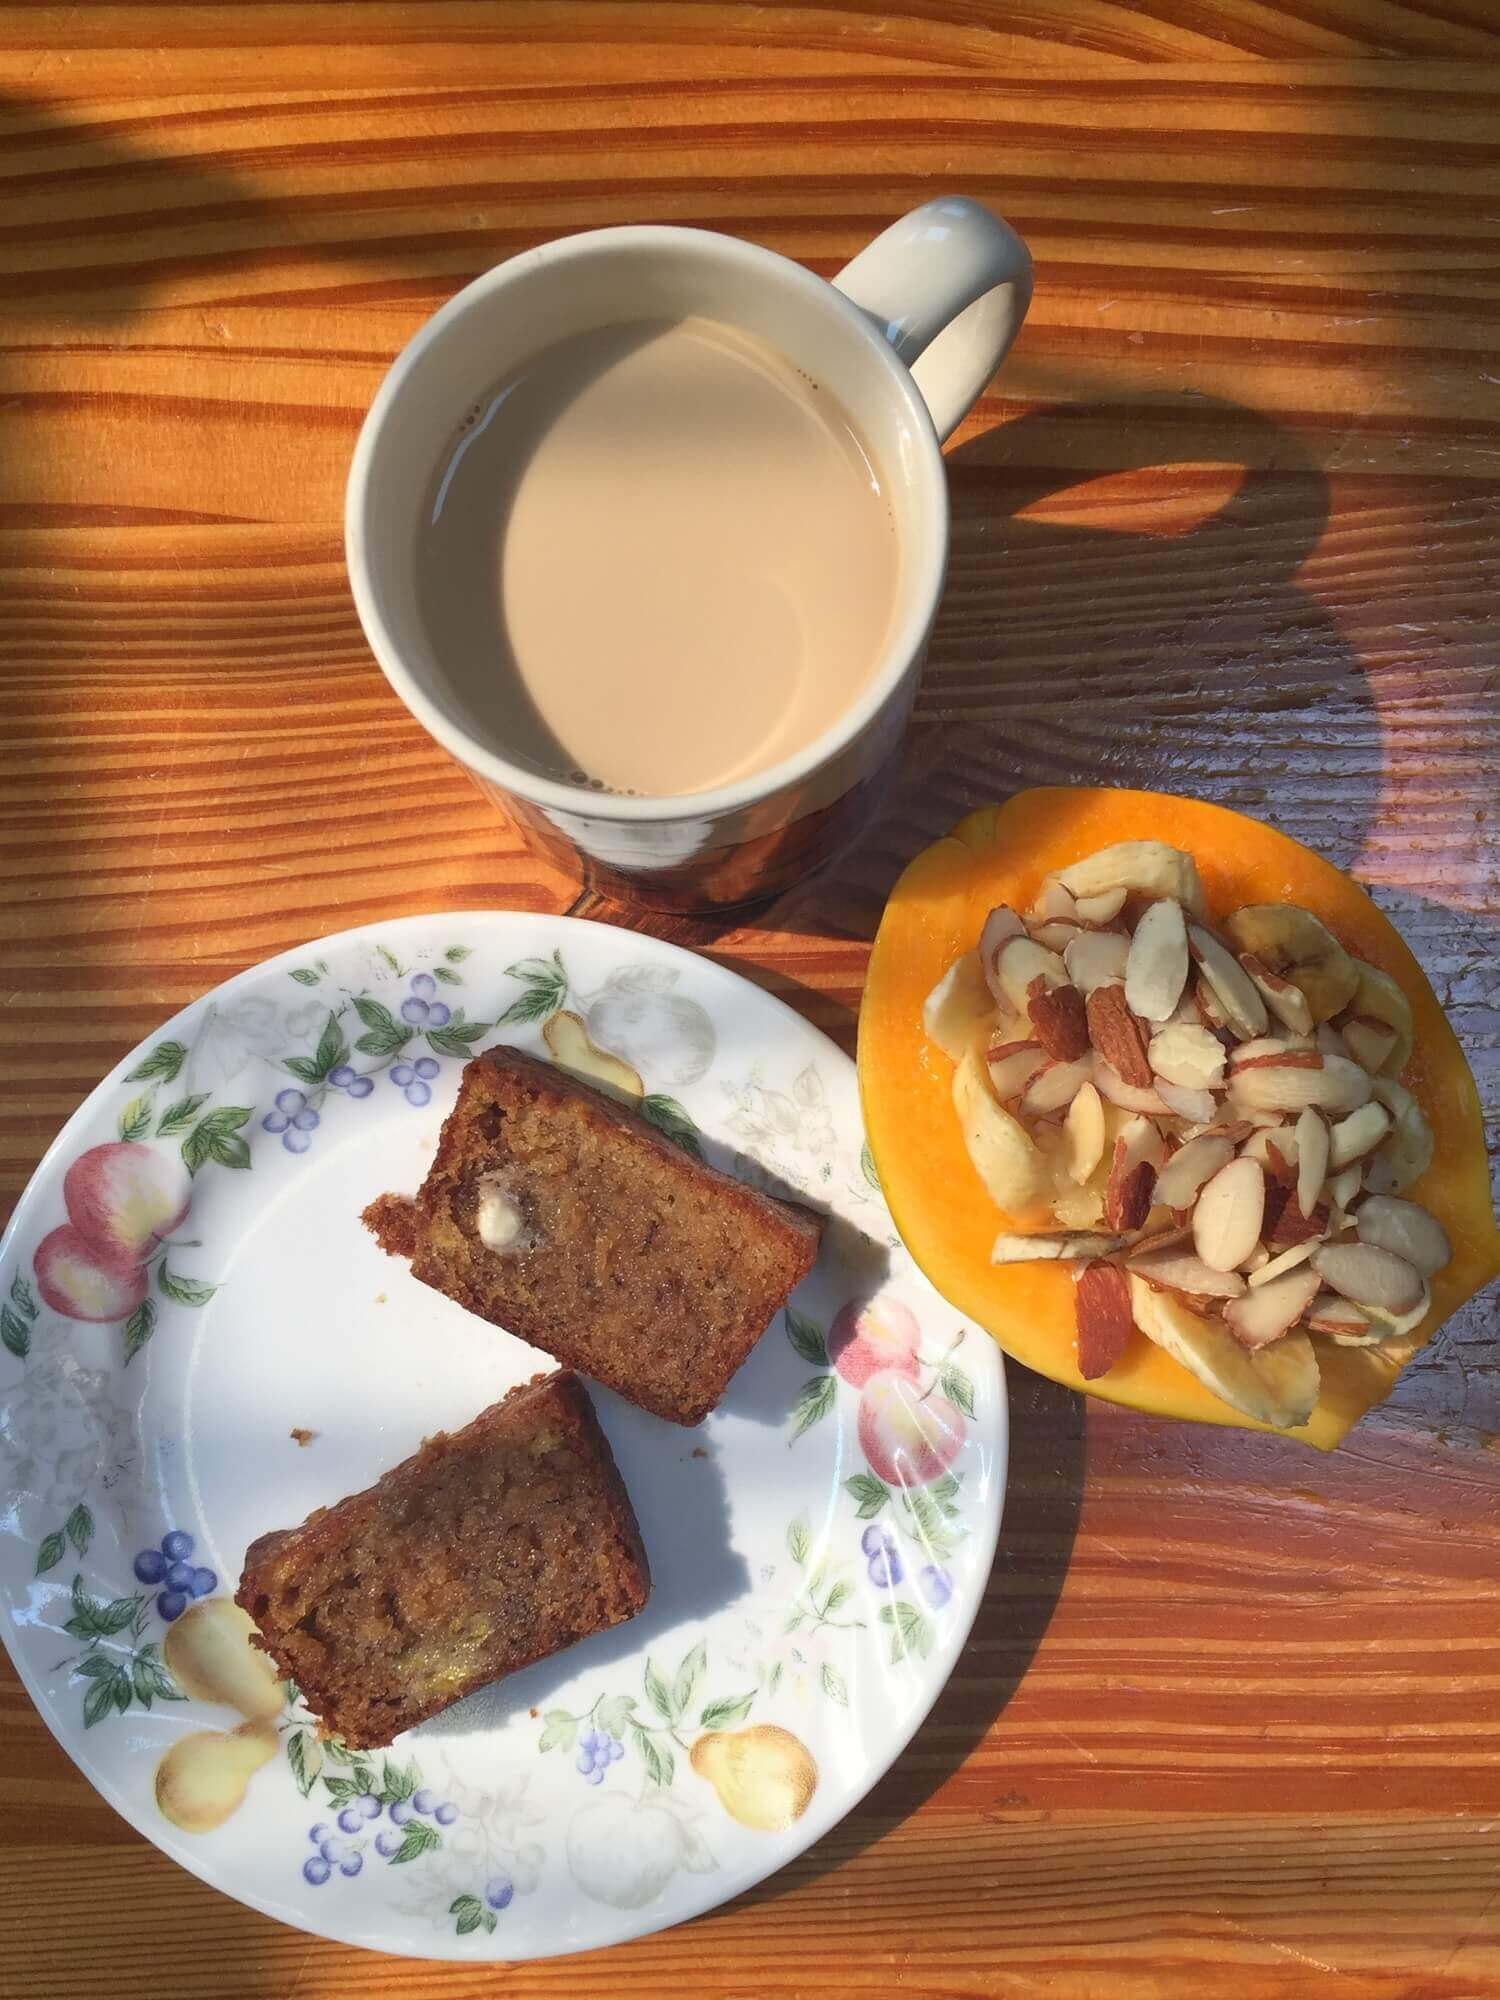 Hotels in volcano - volcano inn - complimentary breakfast